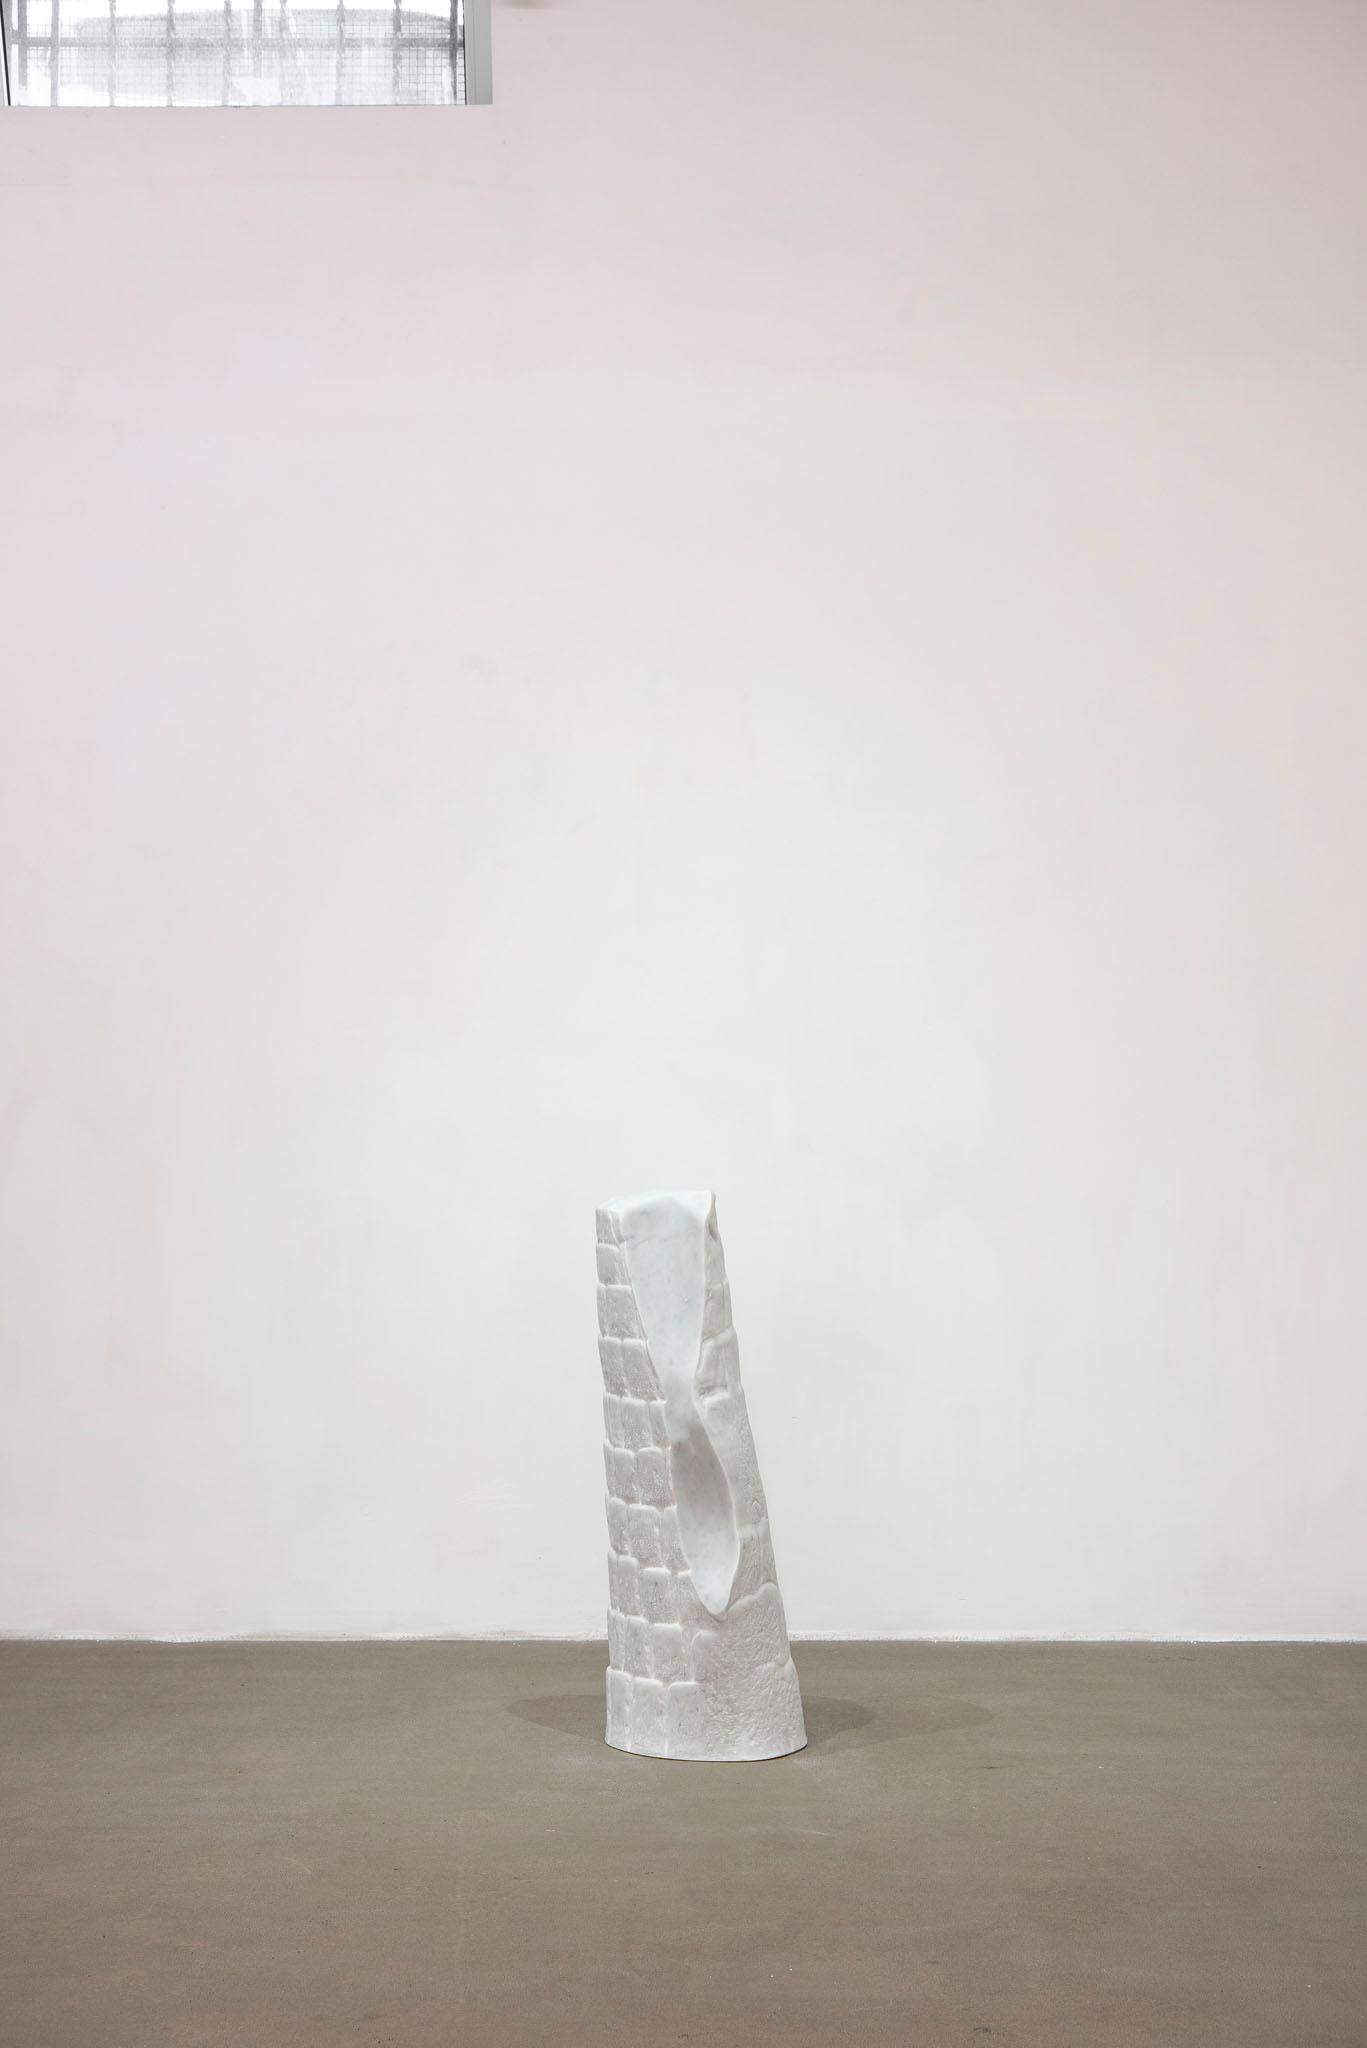 Alicja Kwade SUPPORT (Atleta), 2018; marmo di Carrara; foto Giorgio Benni